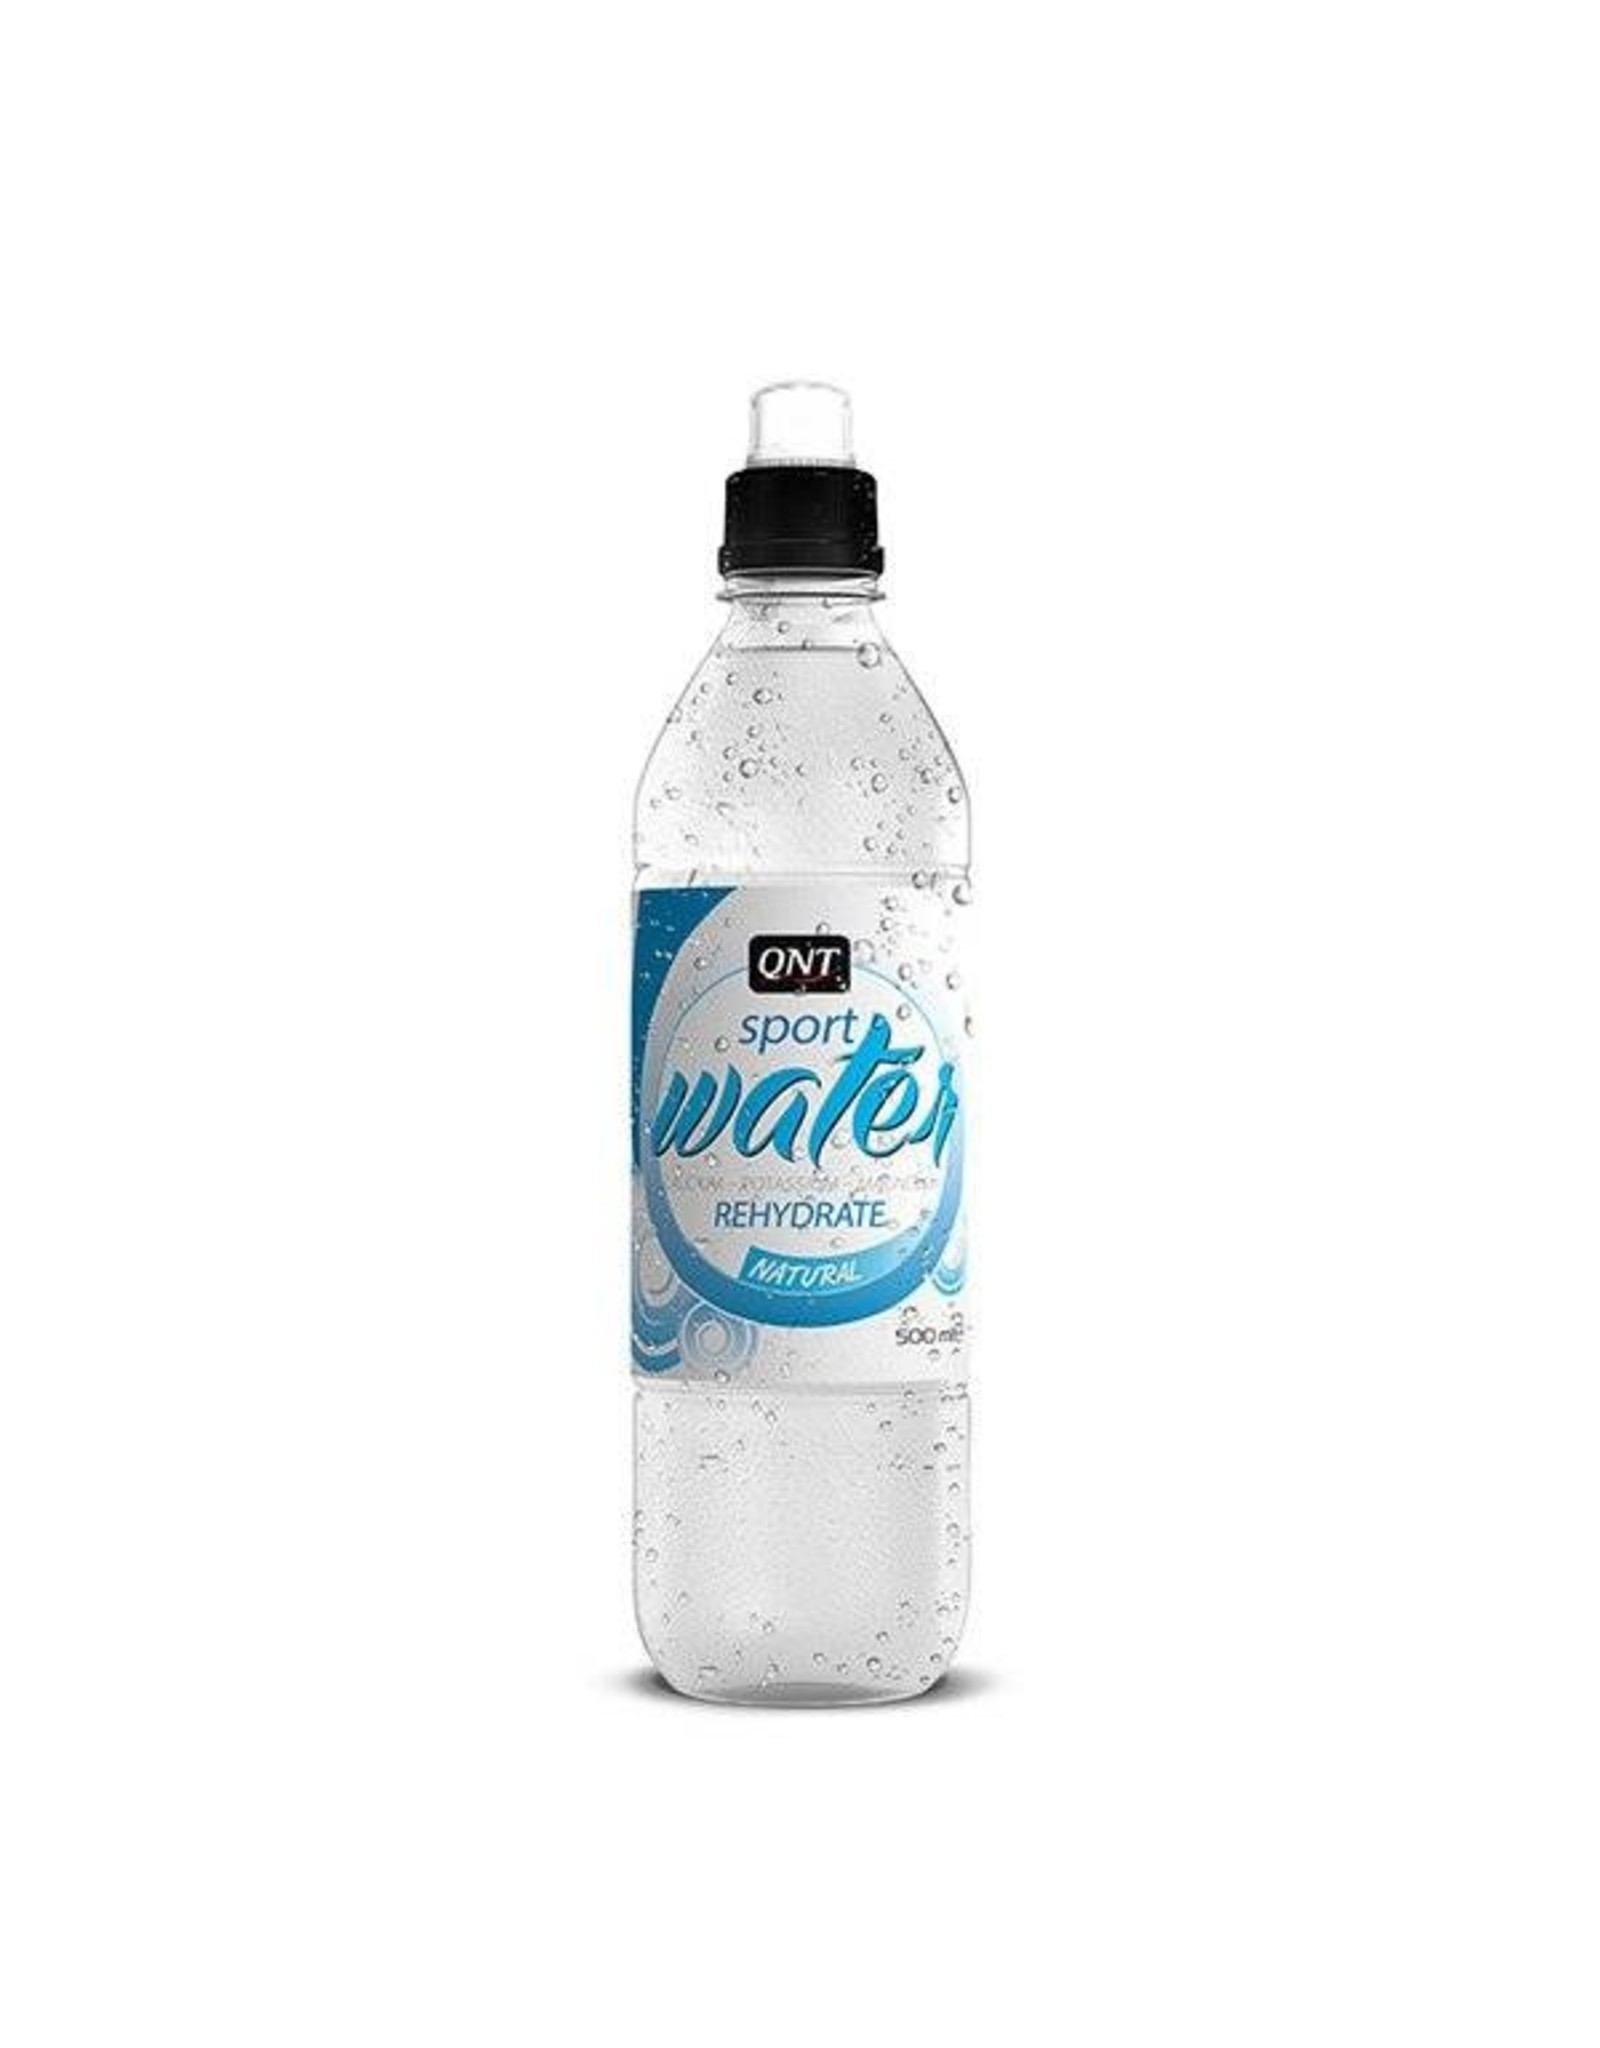 QNT Sport water